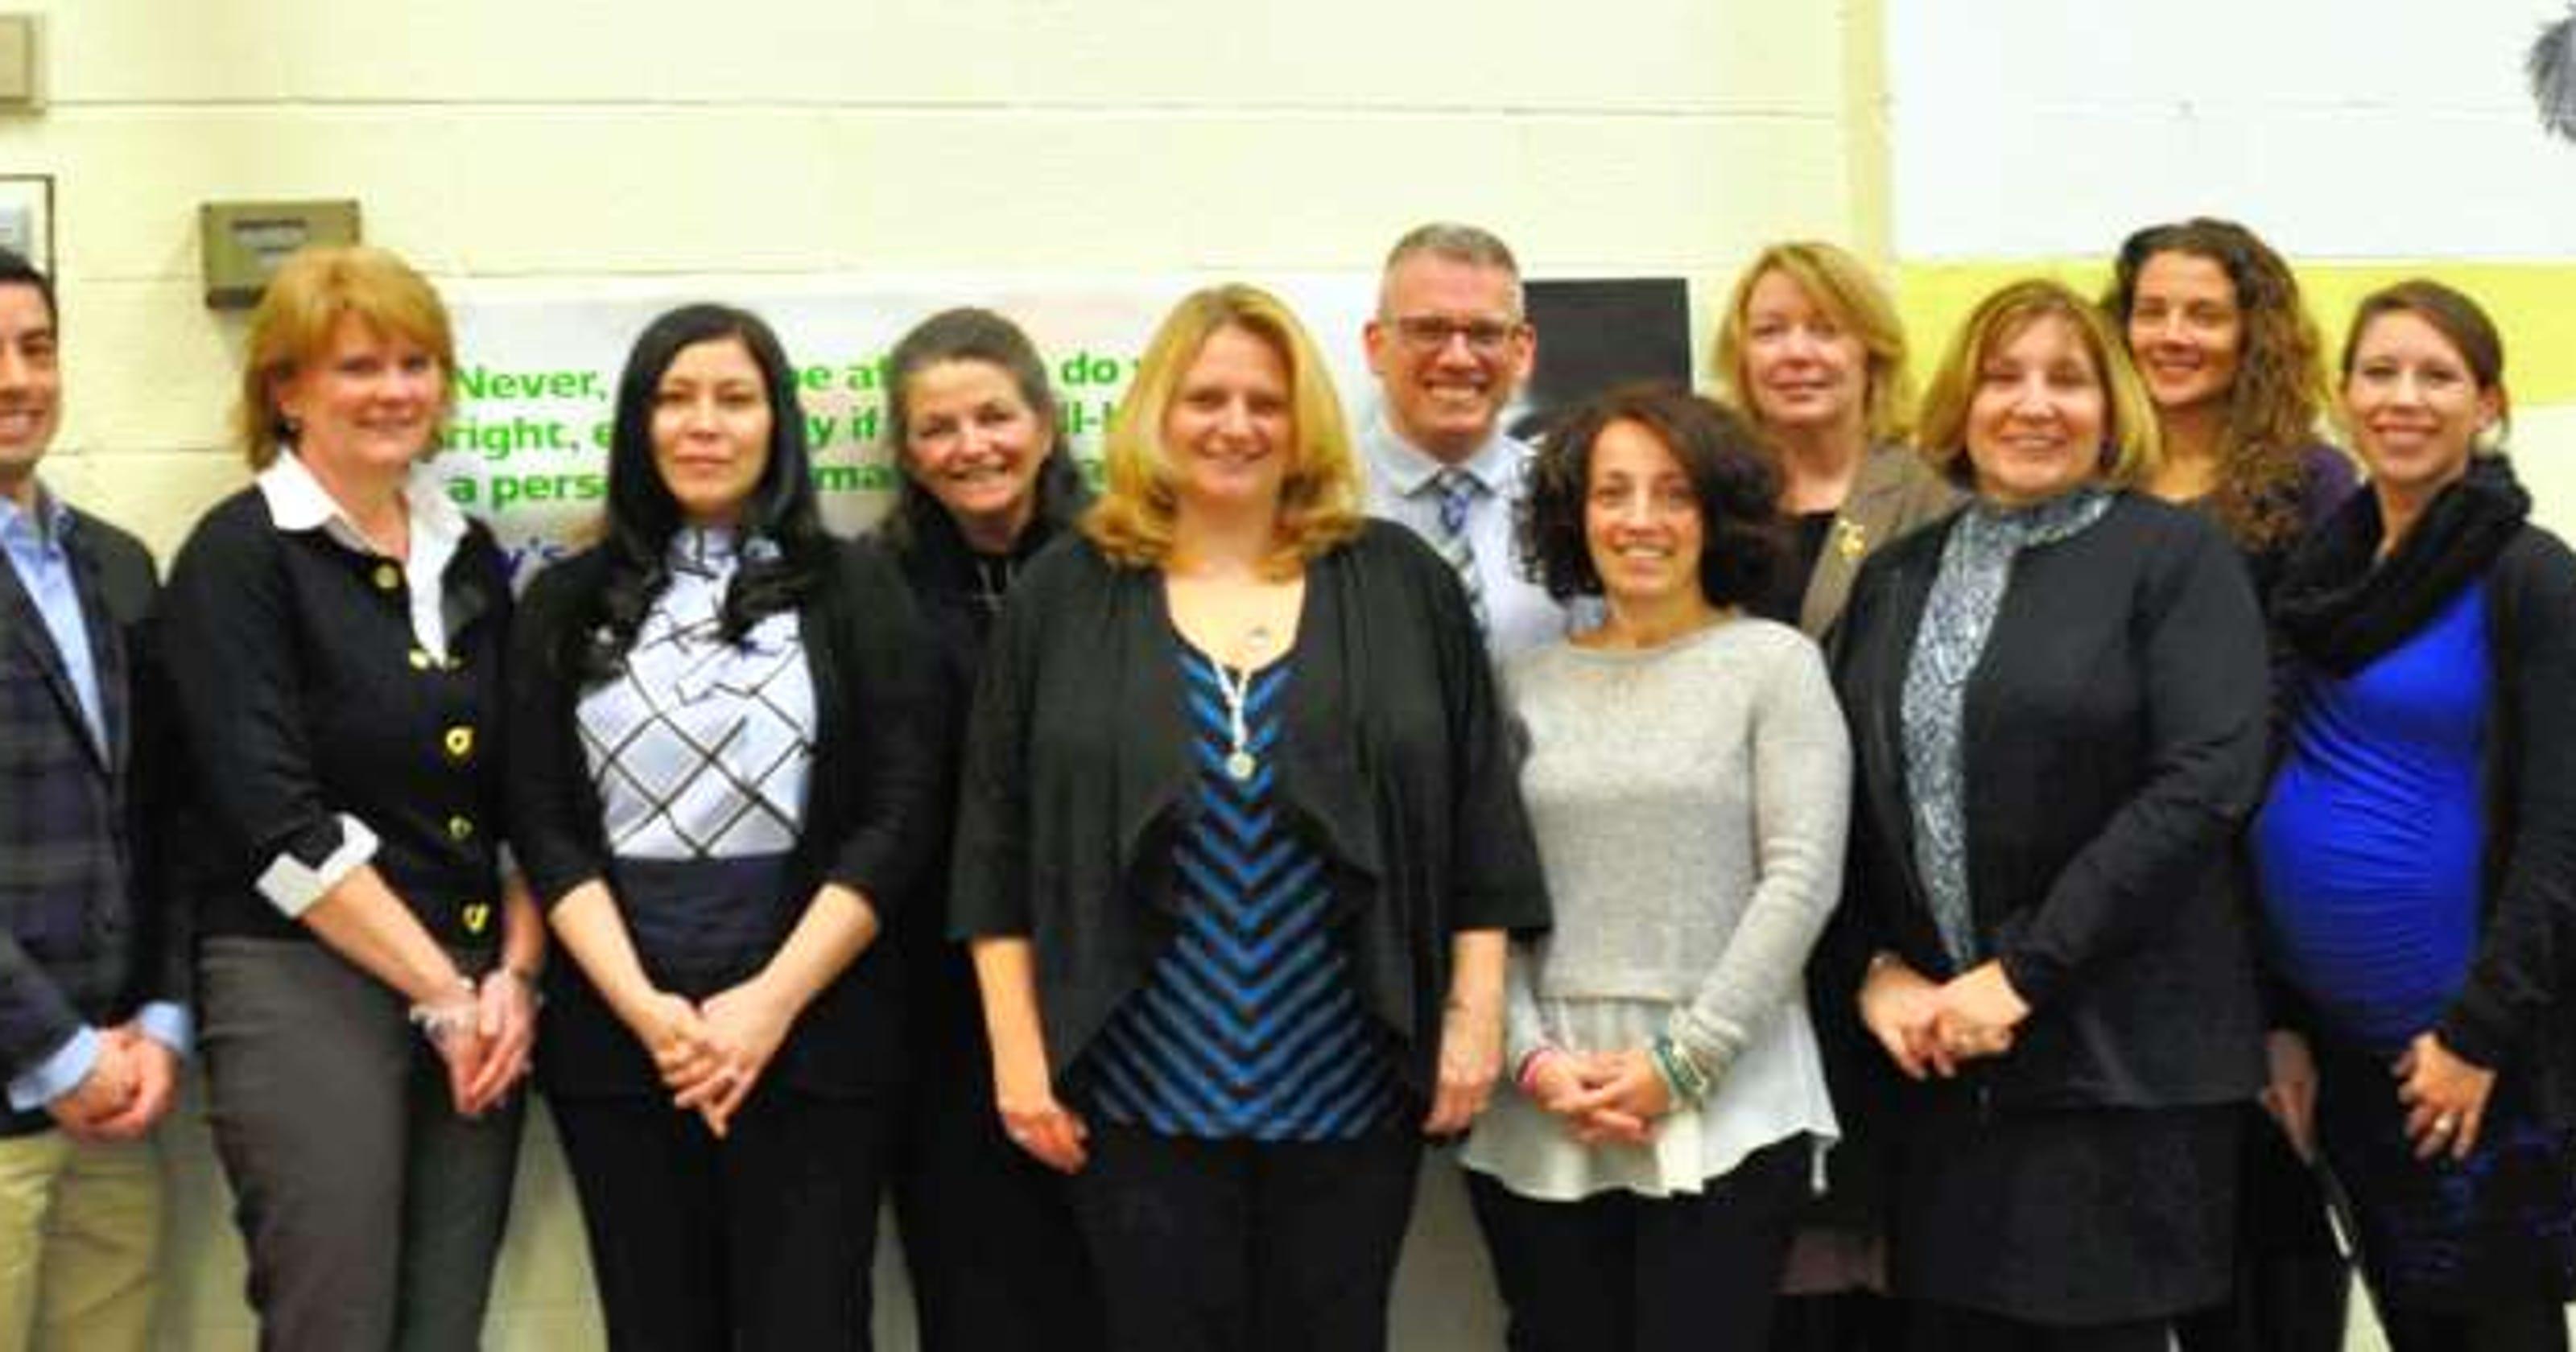 Montville Township teachers are praised as award recipients